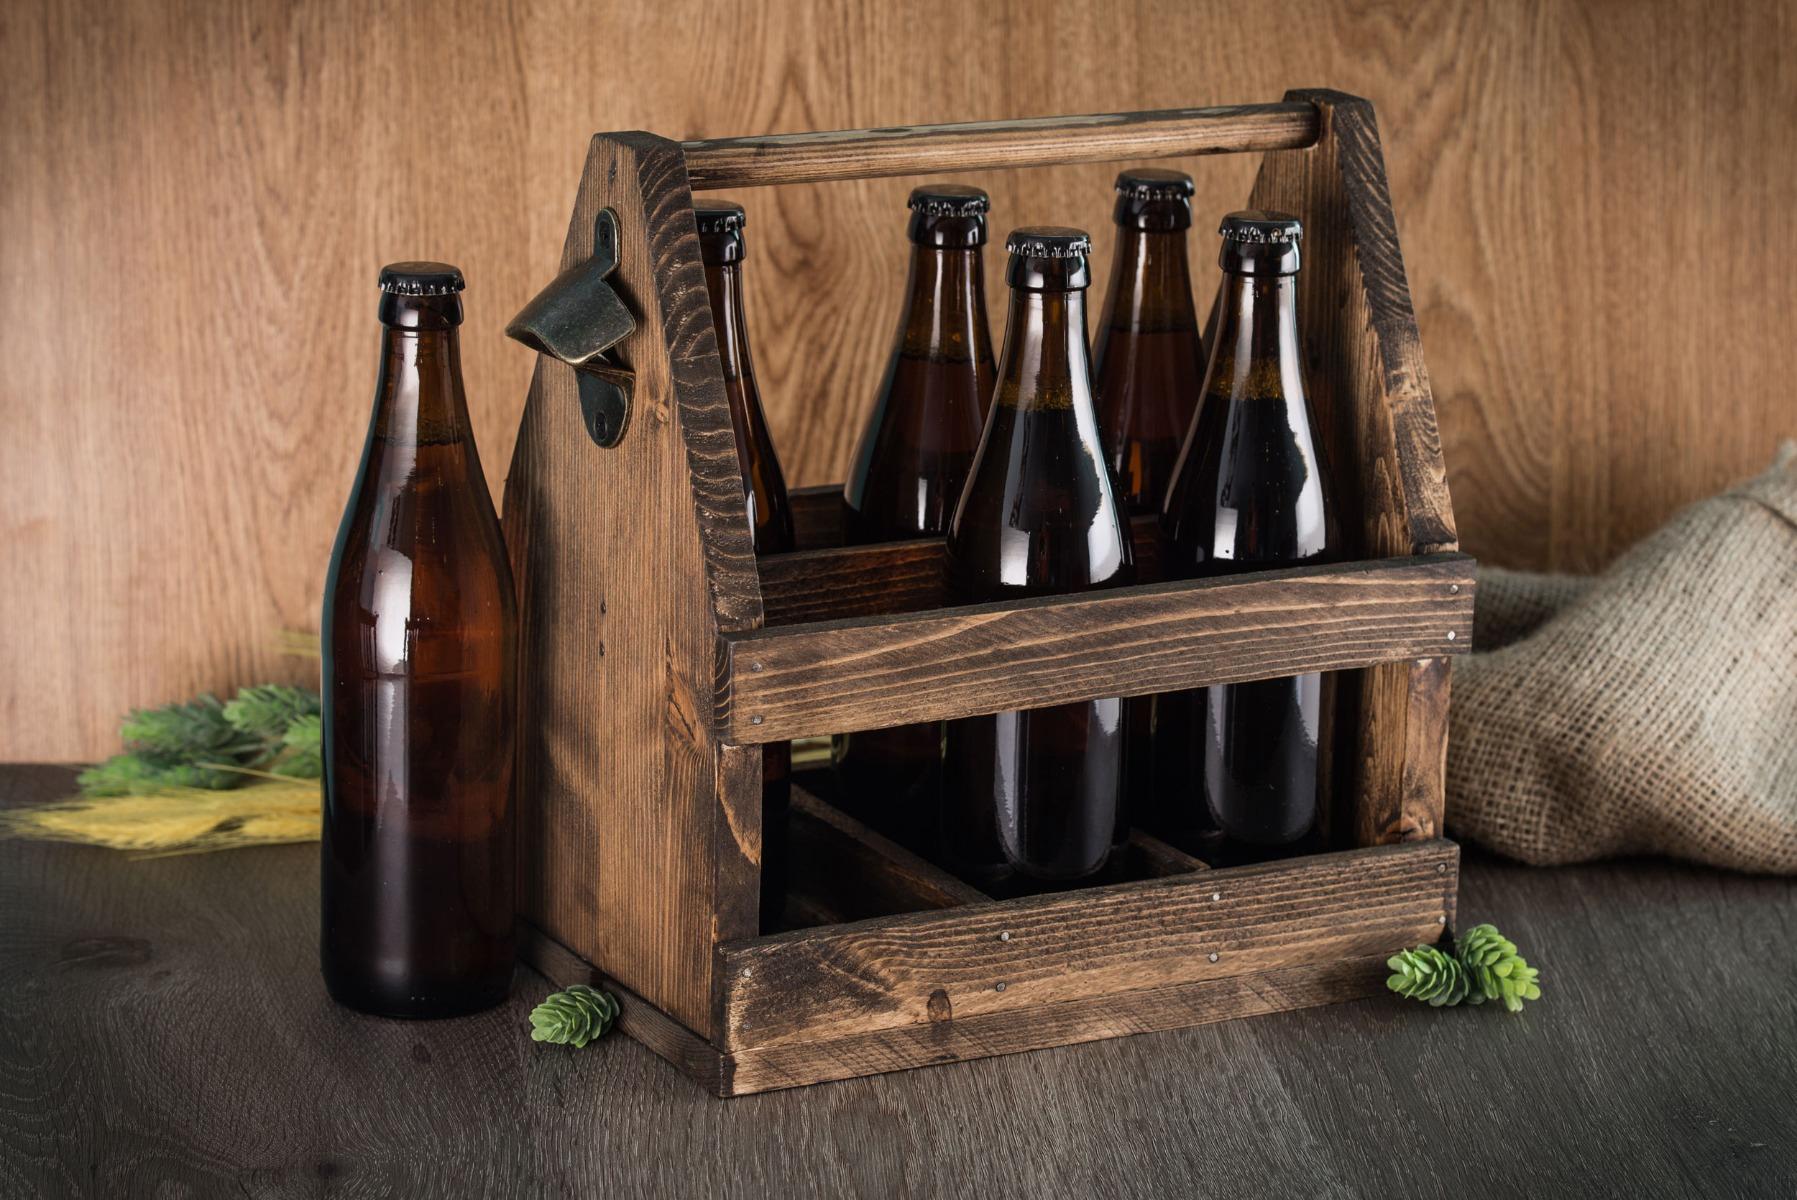 Prik en Tik - Streekbieren- Hoe bewaar ik bier